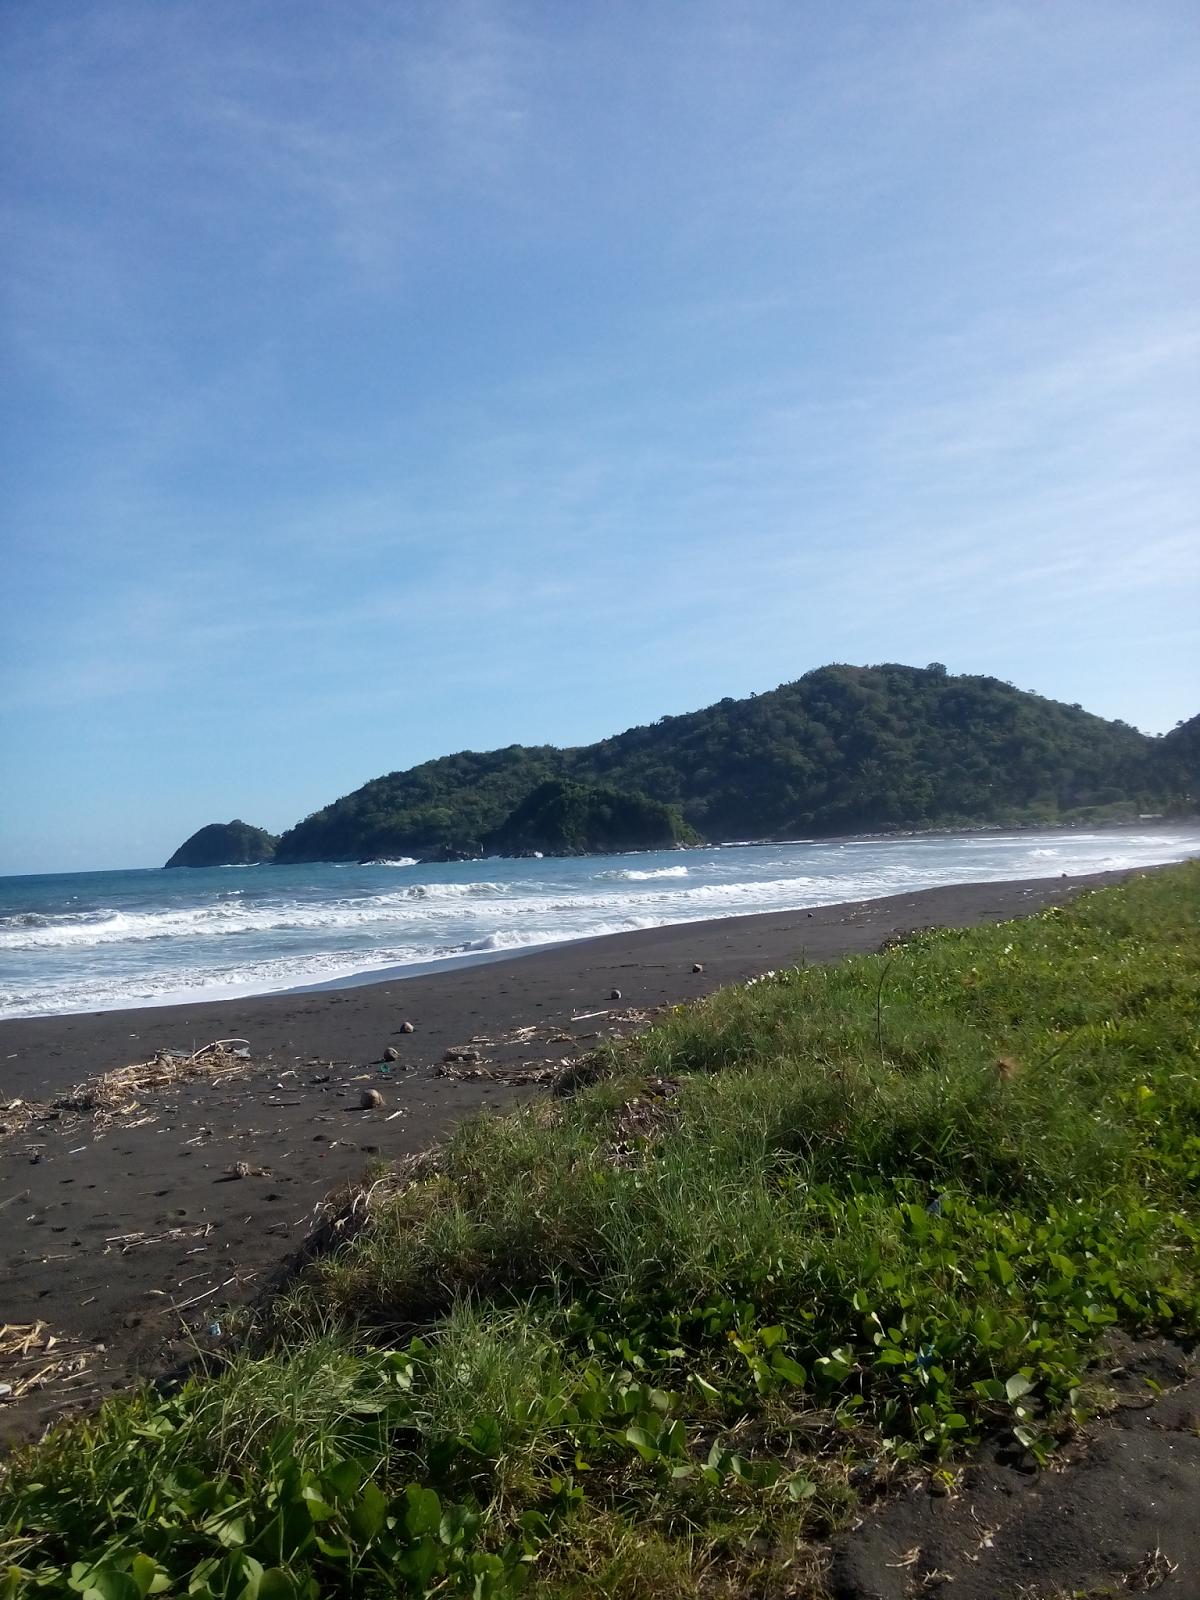 Ekologi Wisata Pesona Pantai Lampon Pesanggaran Kabupaten Banyuwangi Terletak Disebelah